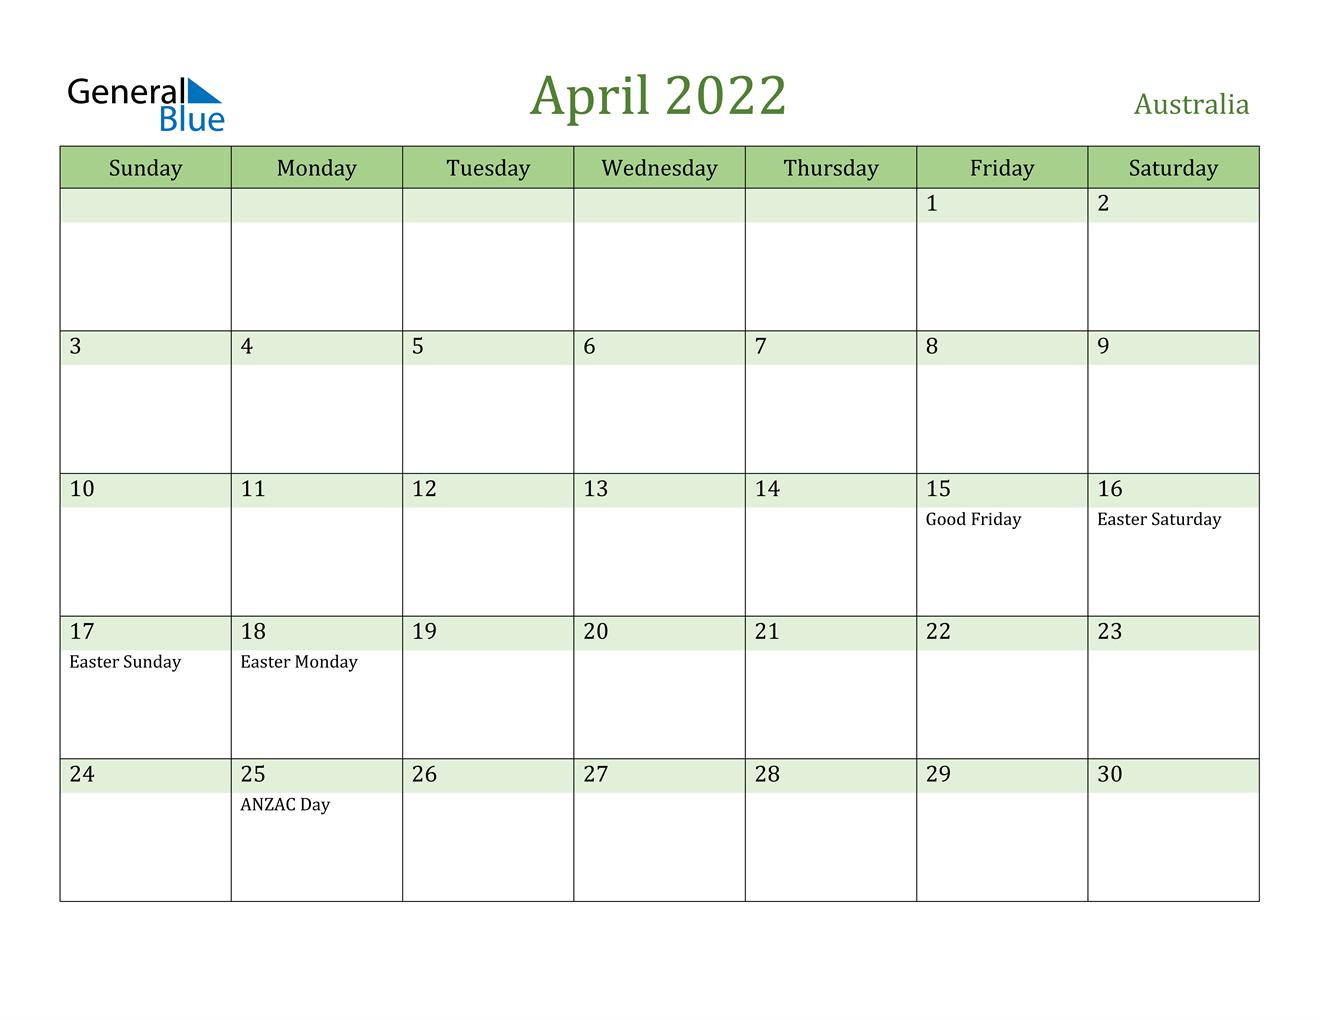 April 2022 Calendar - Australia within Printable April 2022 Calendar